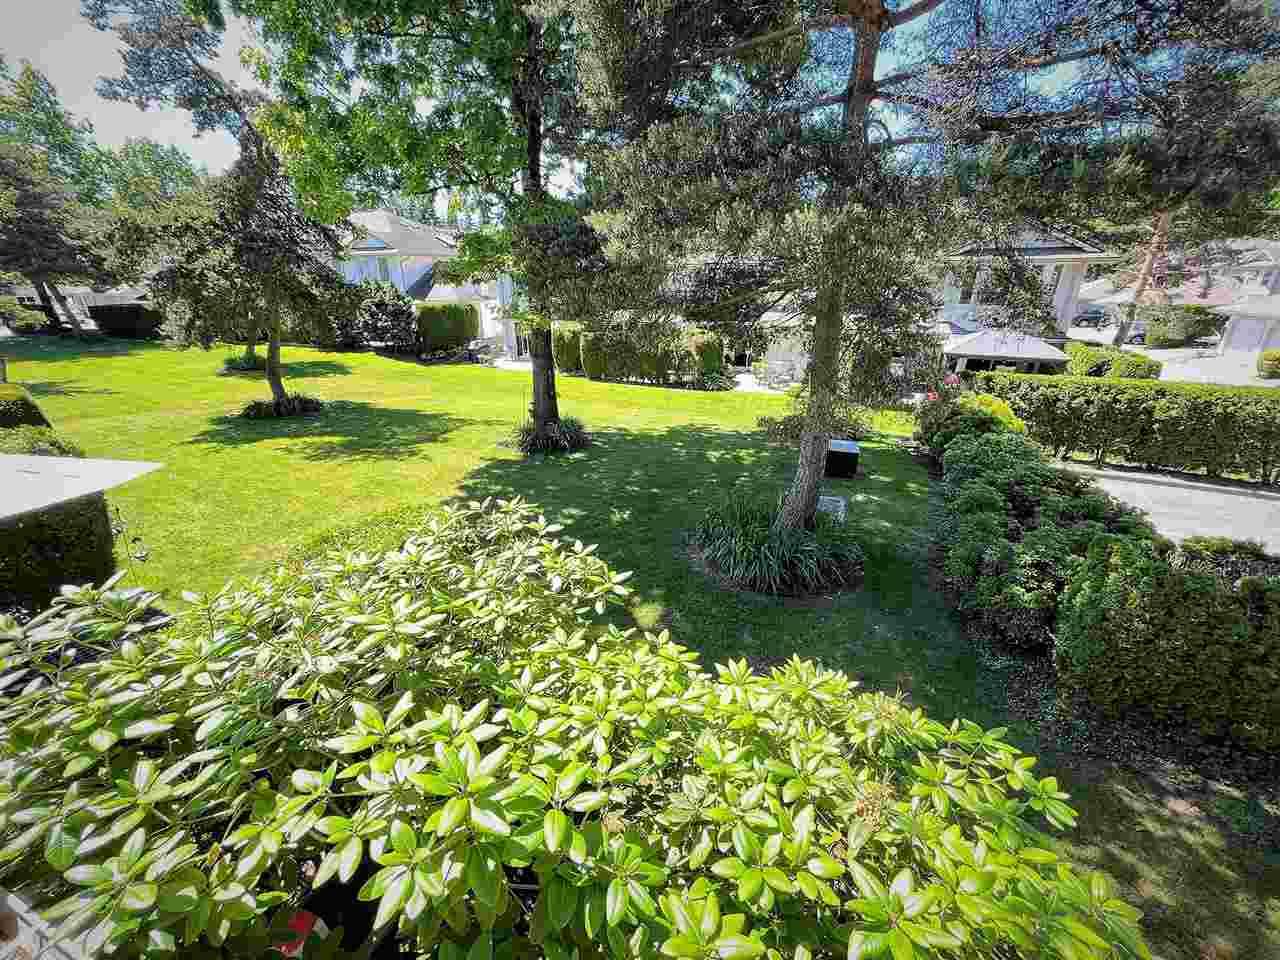 104 9045 WALNUT GROVE DRIVE - Walnut Grove Townhouse for sale, 3 Bedrooms (R2588351) #28